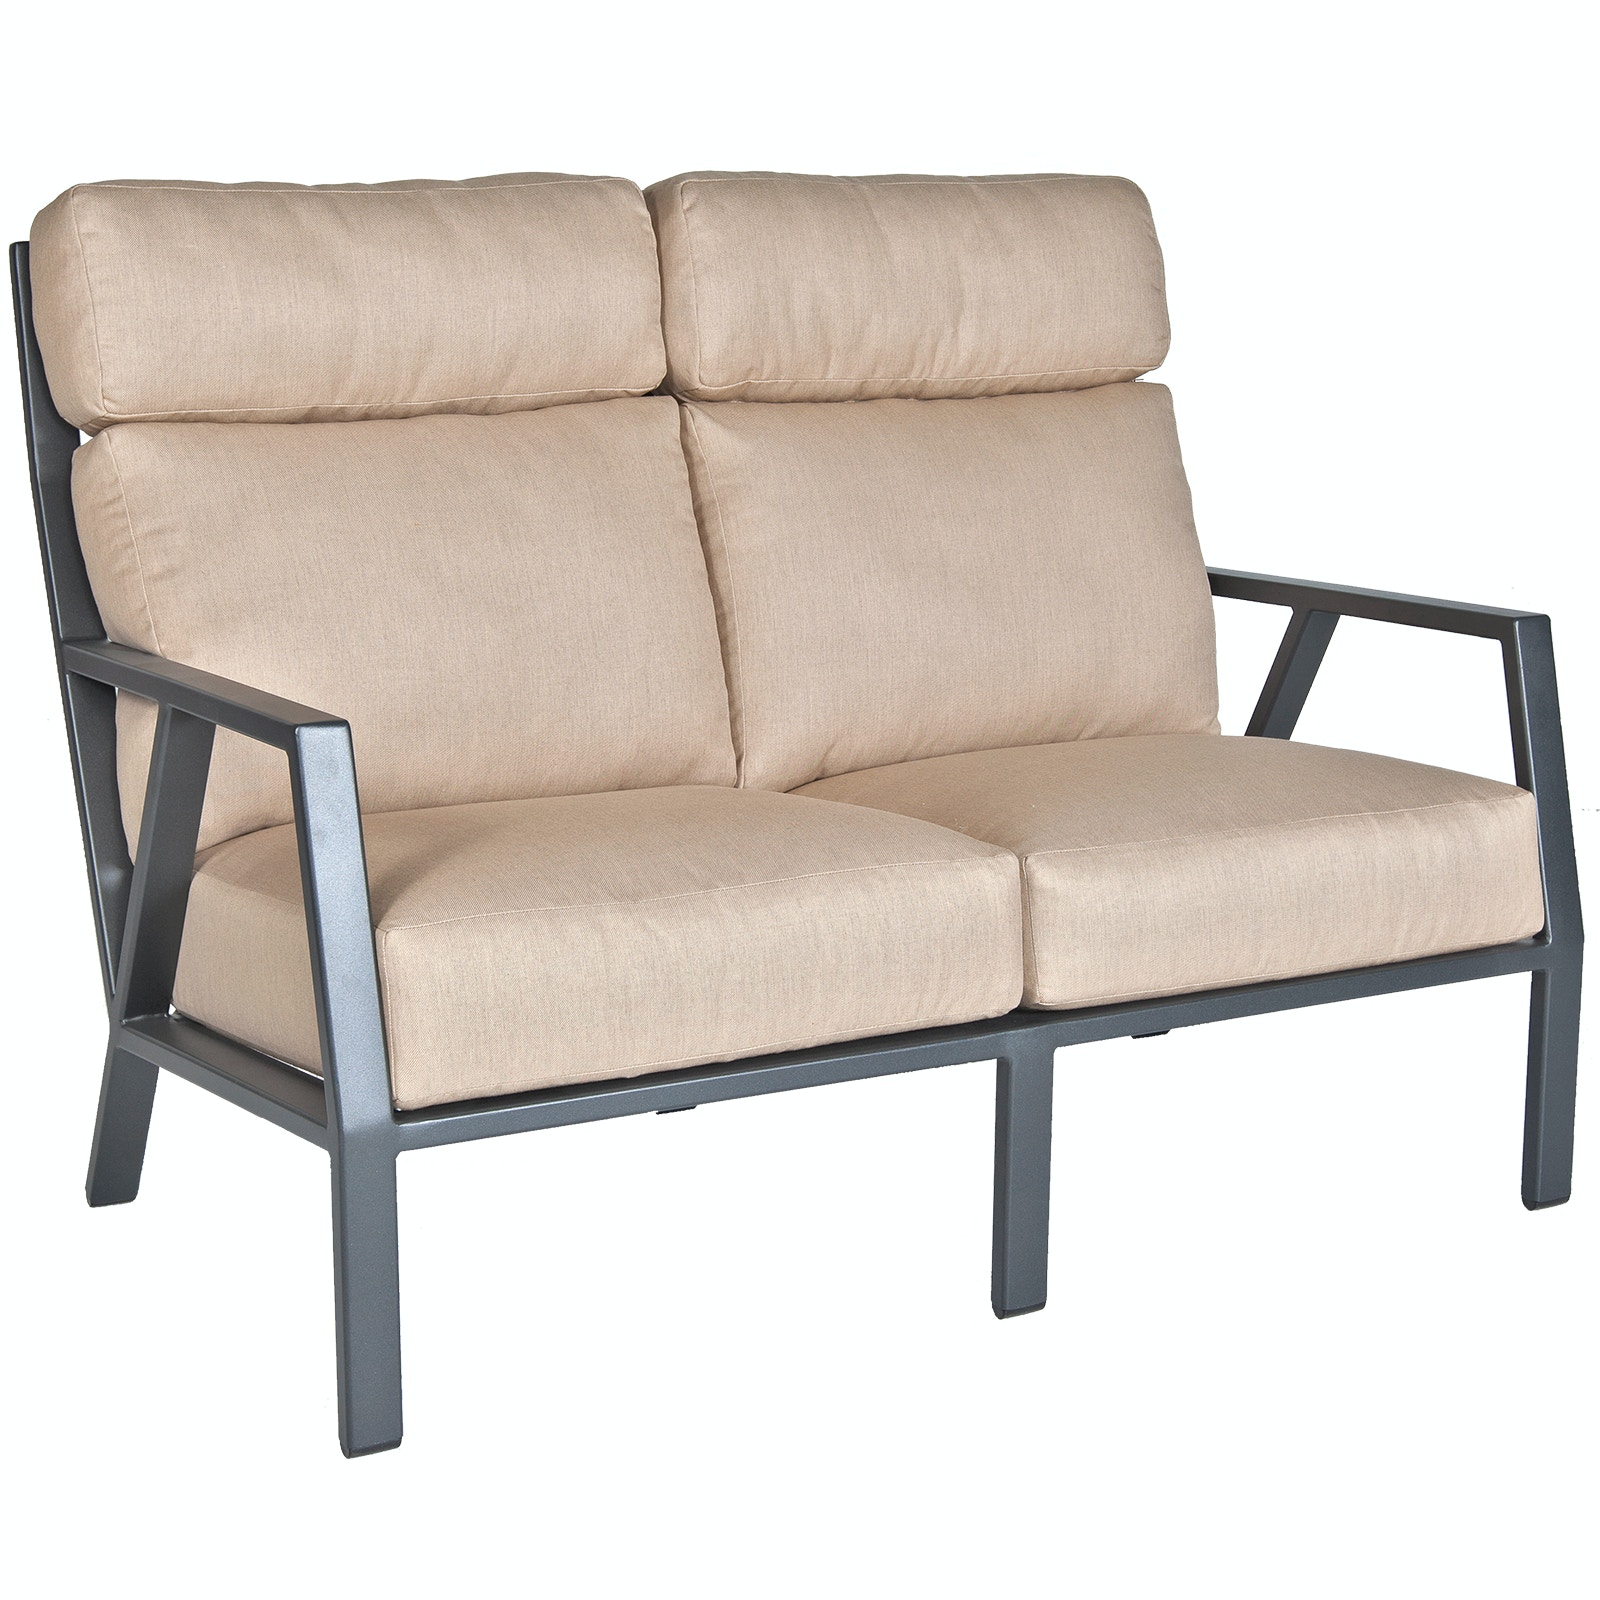 OW Lee Furniture Aris Love Seat 27175 2S